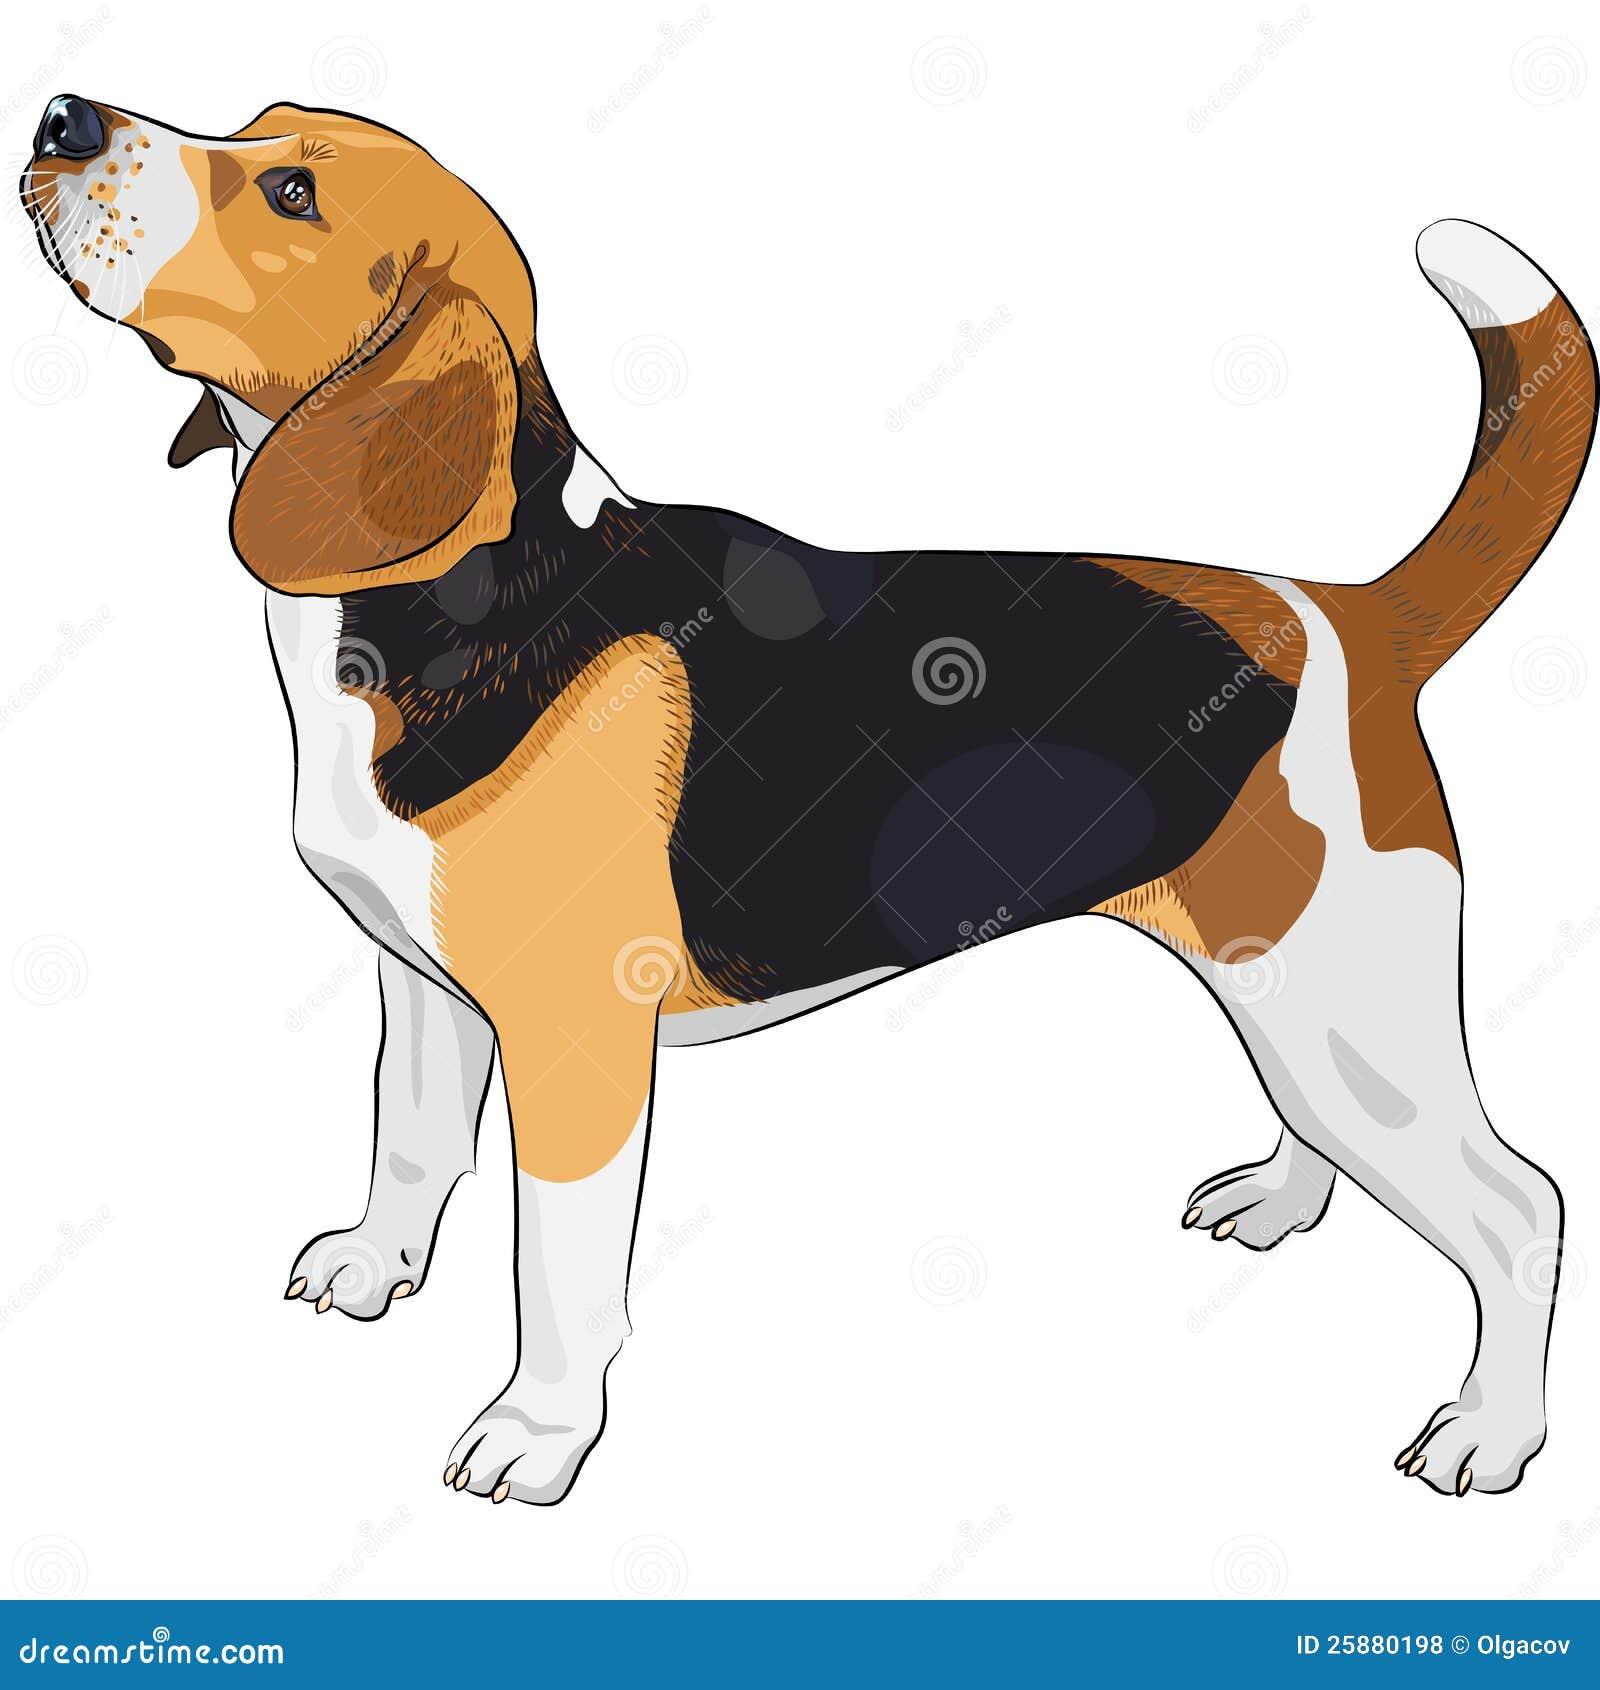 dog clipart royalty free - photo #42